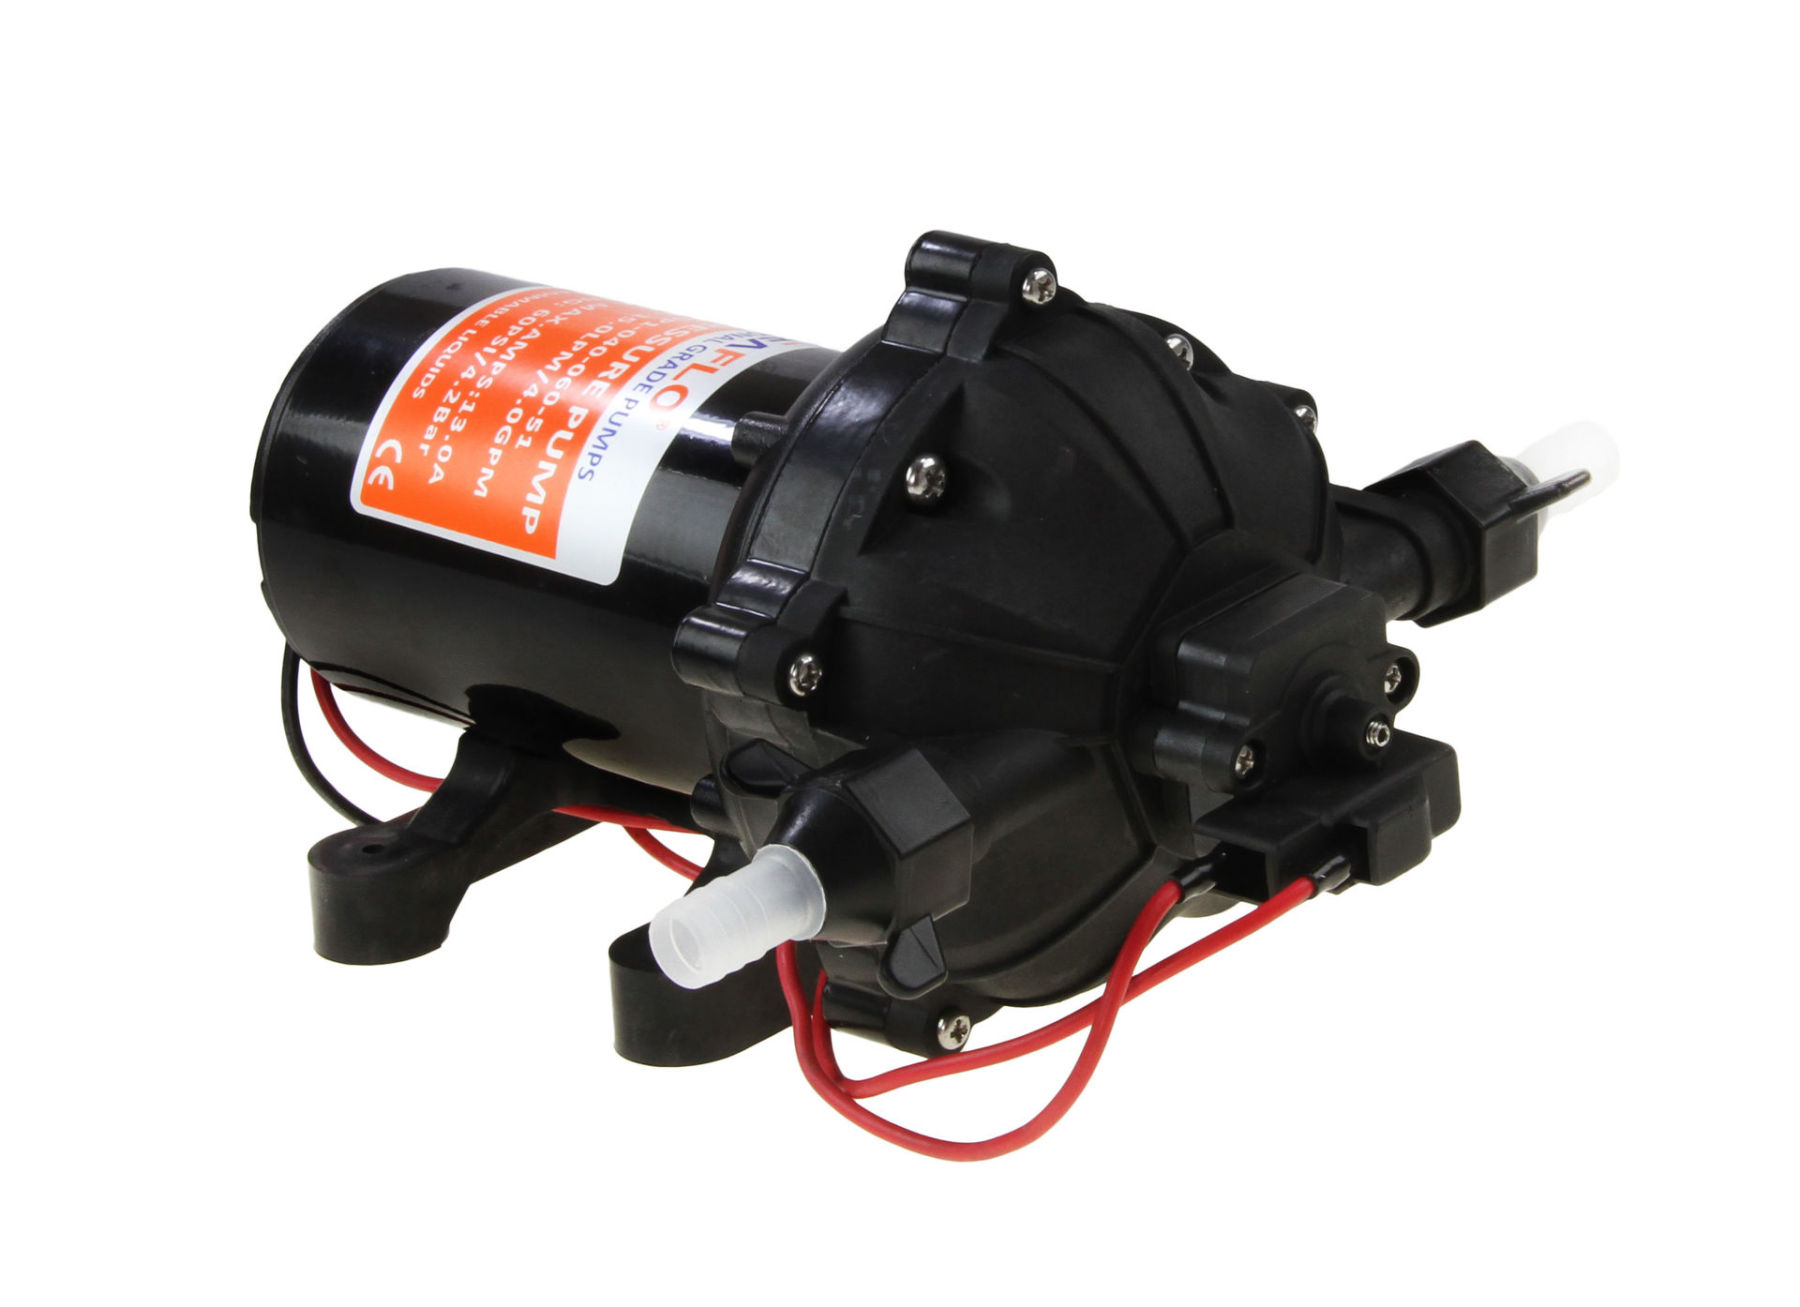 Pump Water Supply Membrane SeaFlo 12 V, L/min, 4.2, 7 AND SFDP104006051